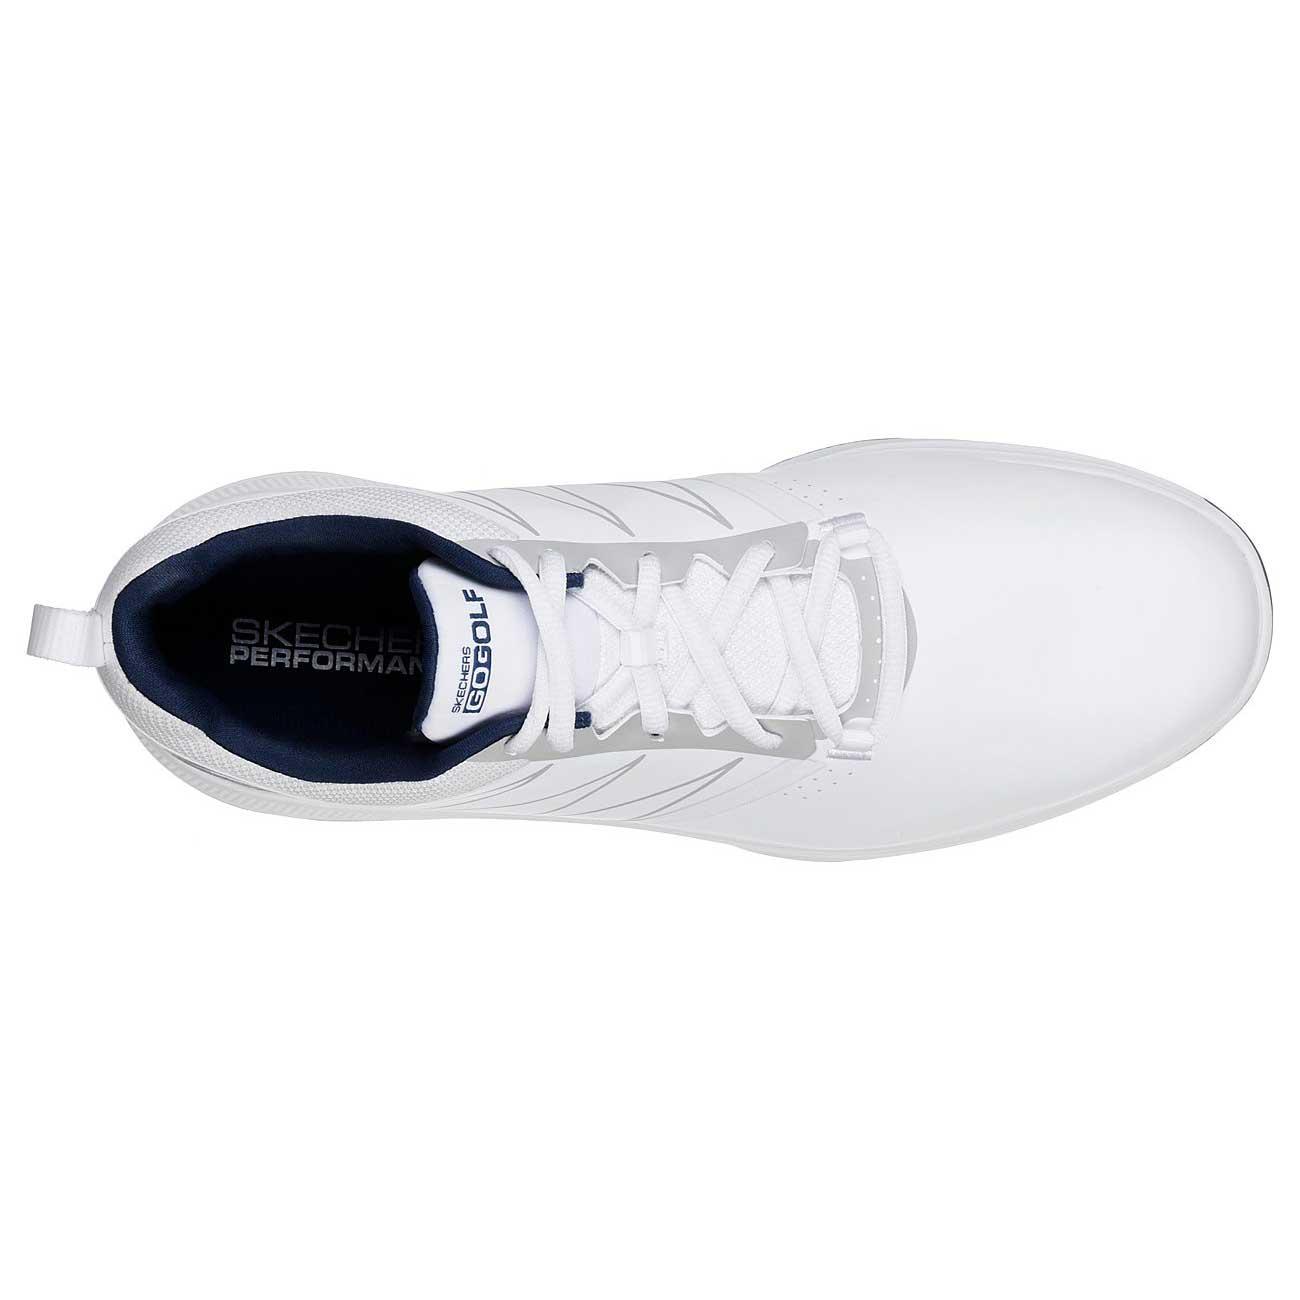 Skechers Men's Go Golf Torque White/Navy Golf Shoe